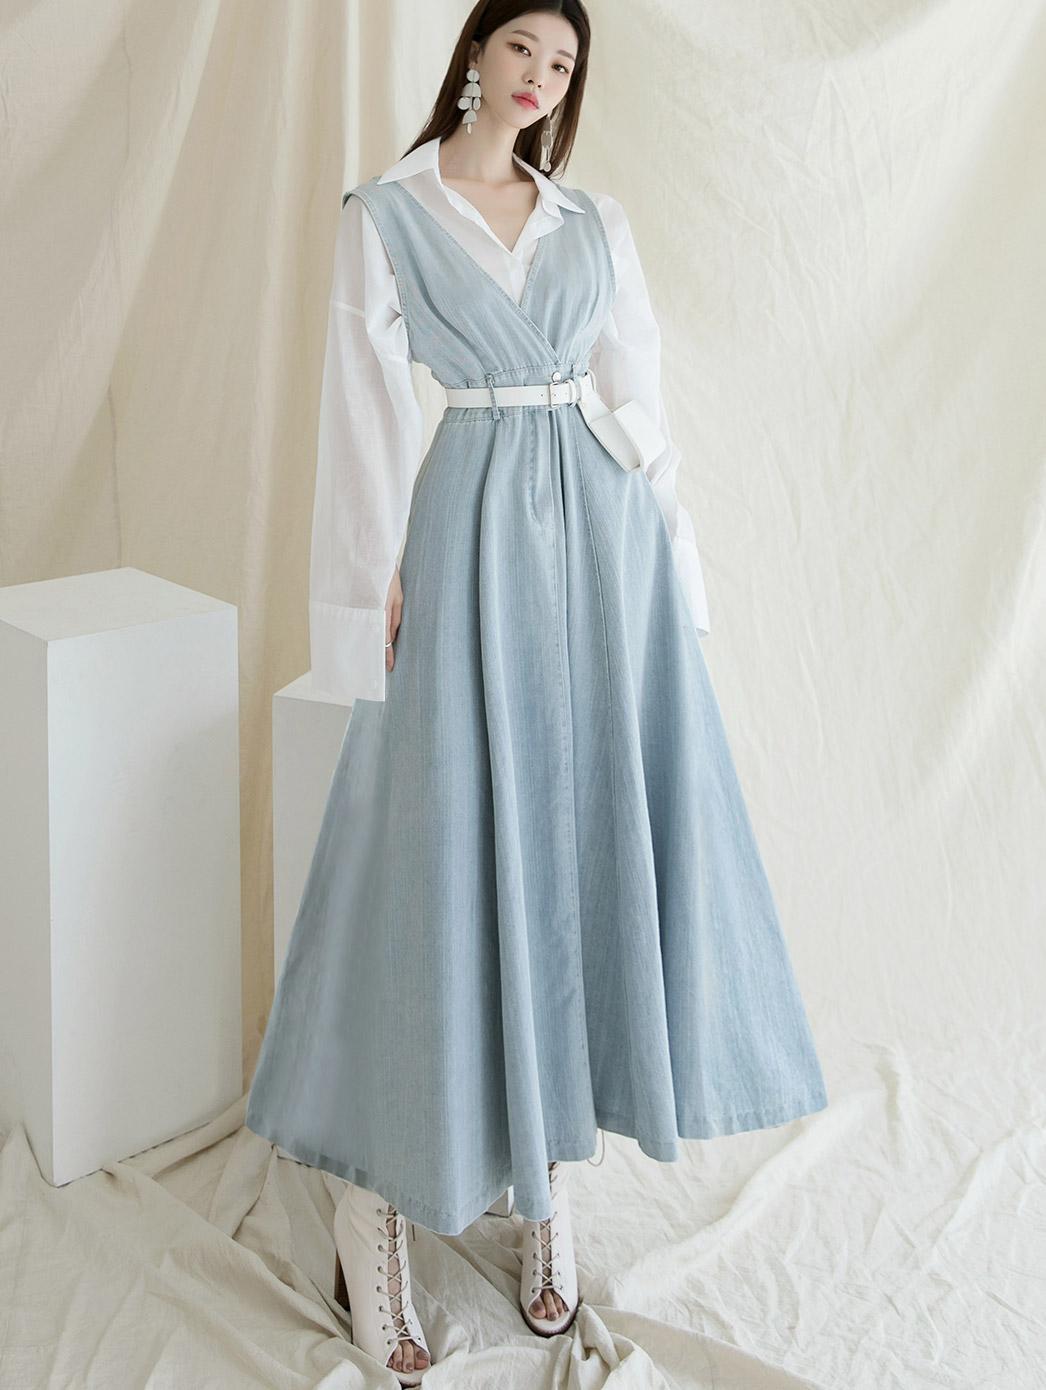 D4049 드맹 Sleeveless Denim Dress(21st REORDER)